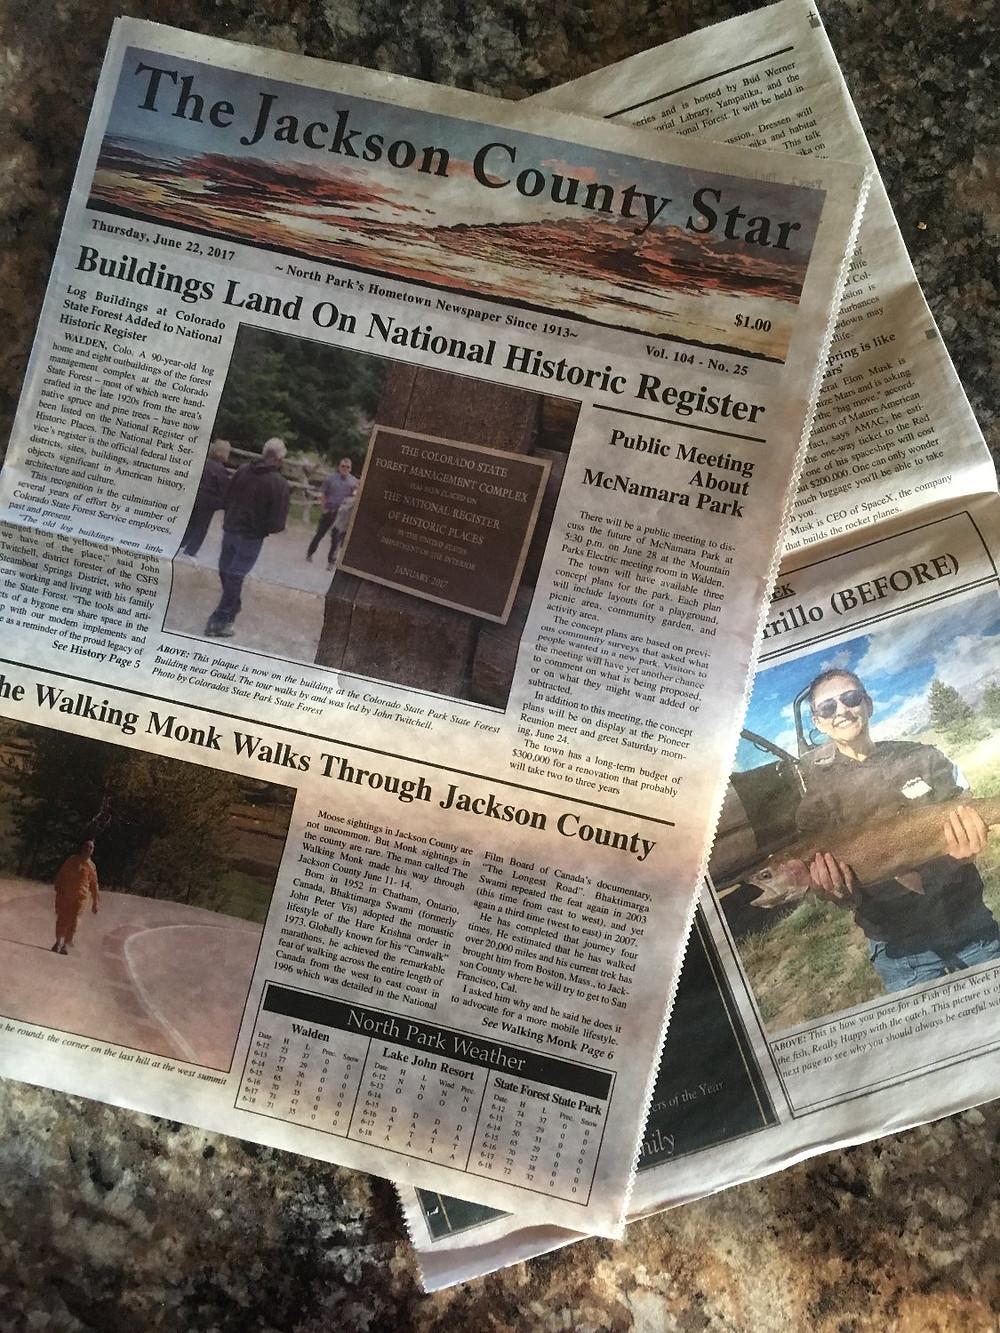 Jackson County Star, June 22, 2017